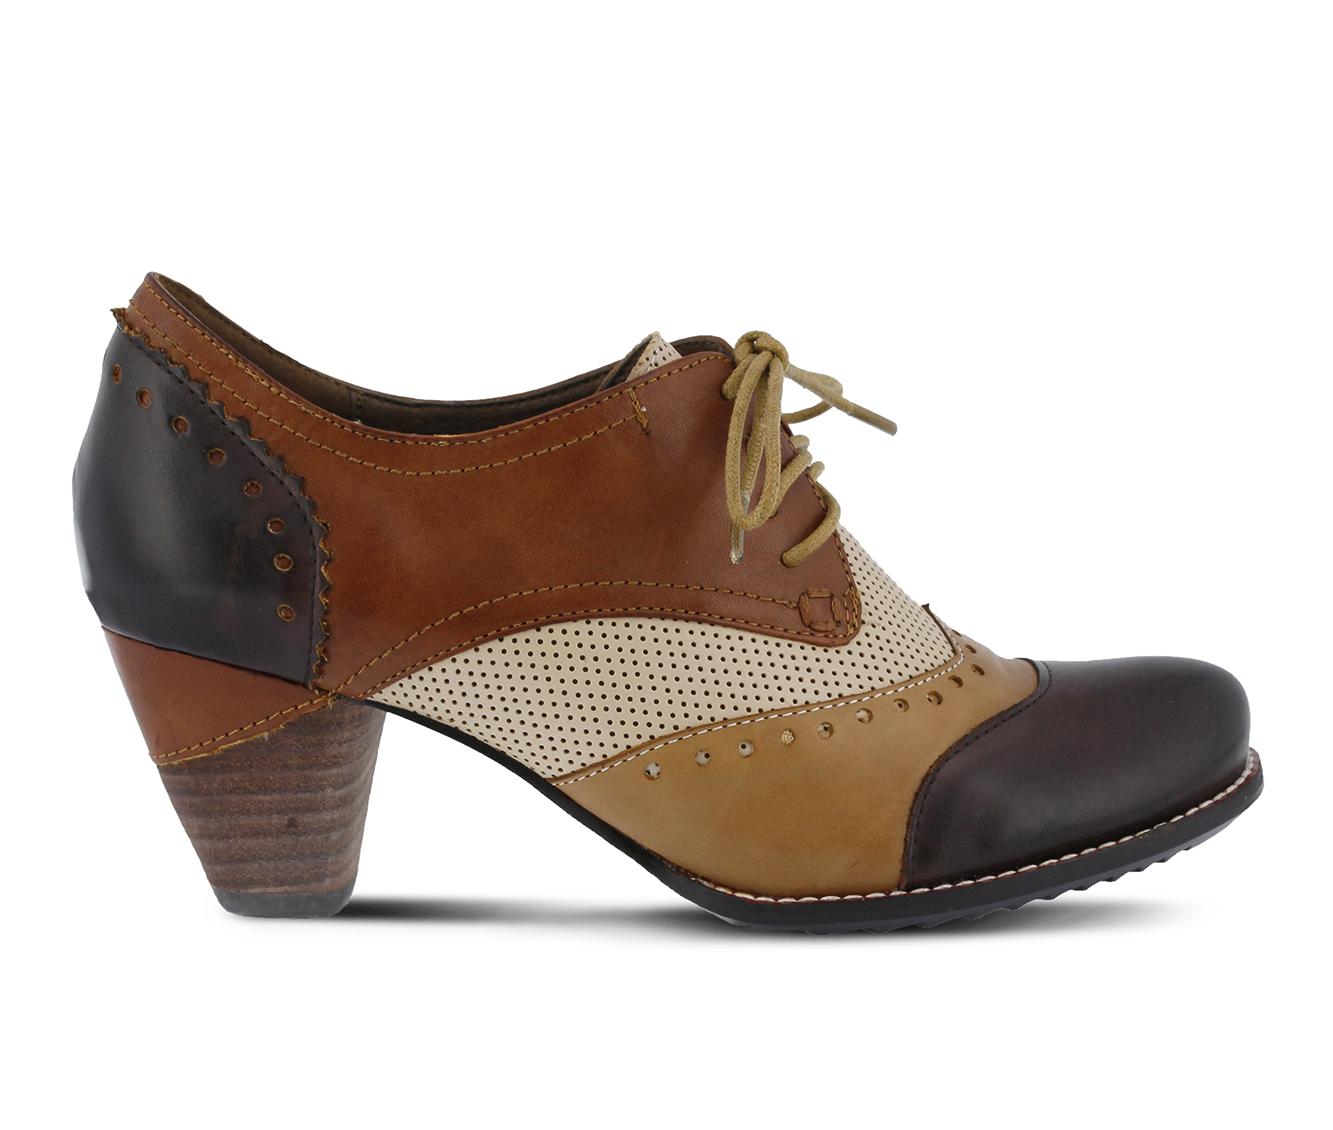 L'Artiste Bardot Women's Dress Shoe (Brown Leather)